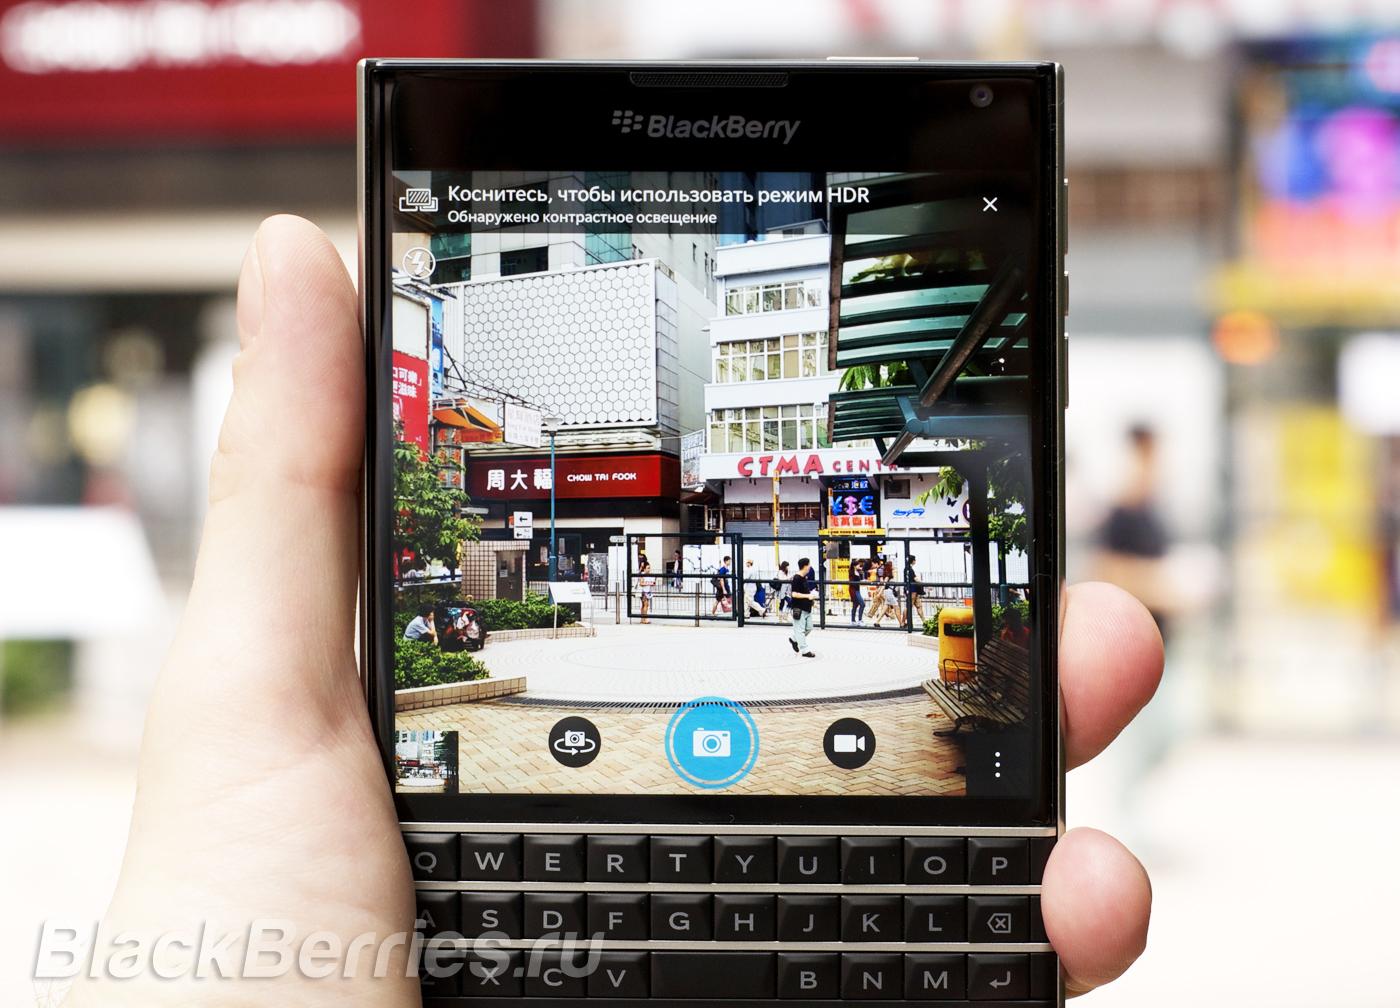 BlackBerry-Passport-Review-31